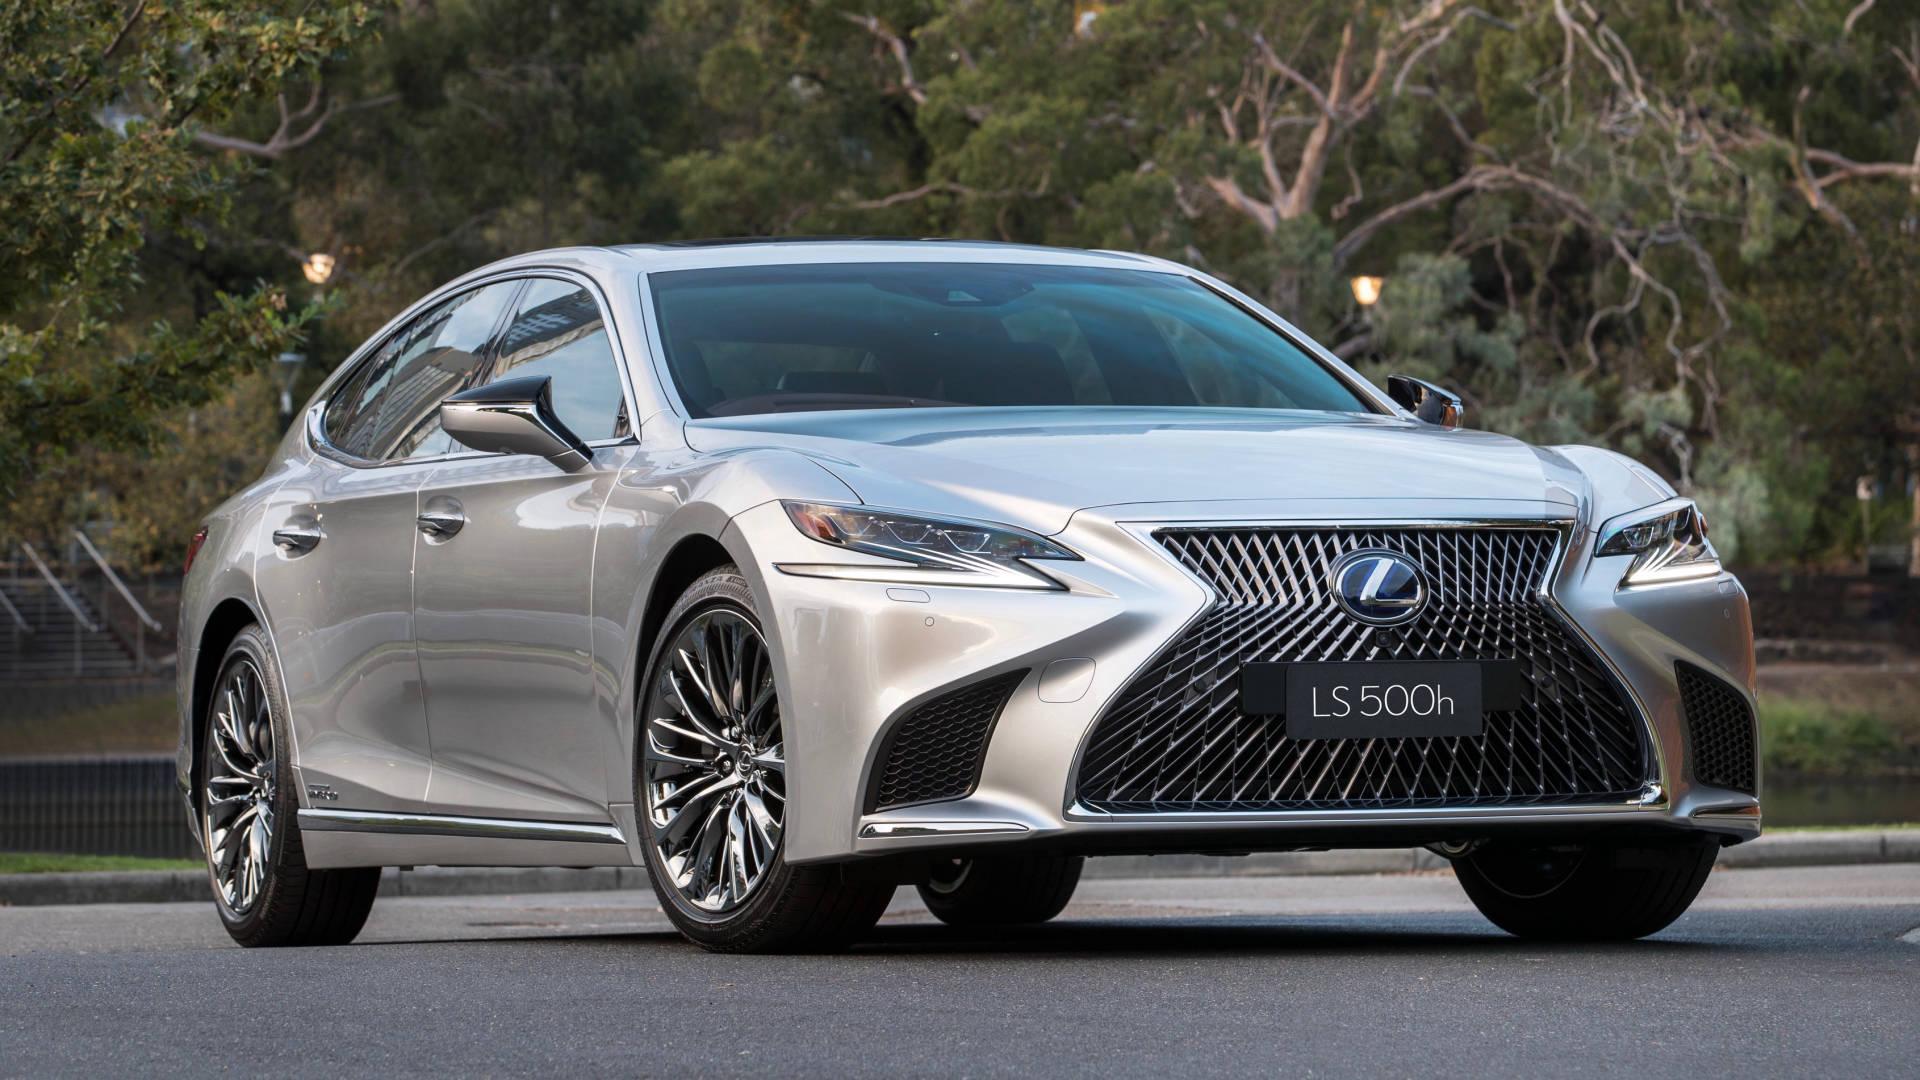 2018 Lexus LS silver front 3/4 parked